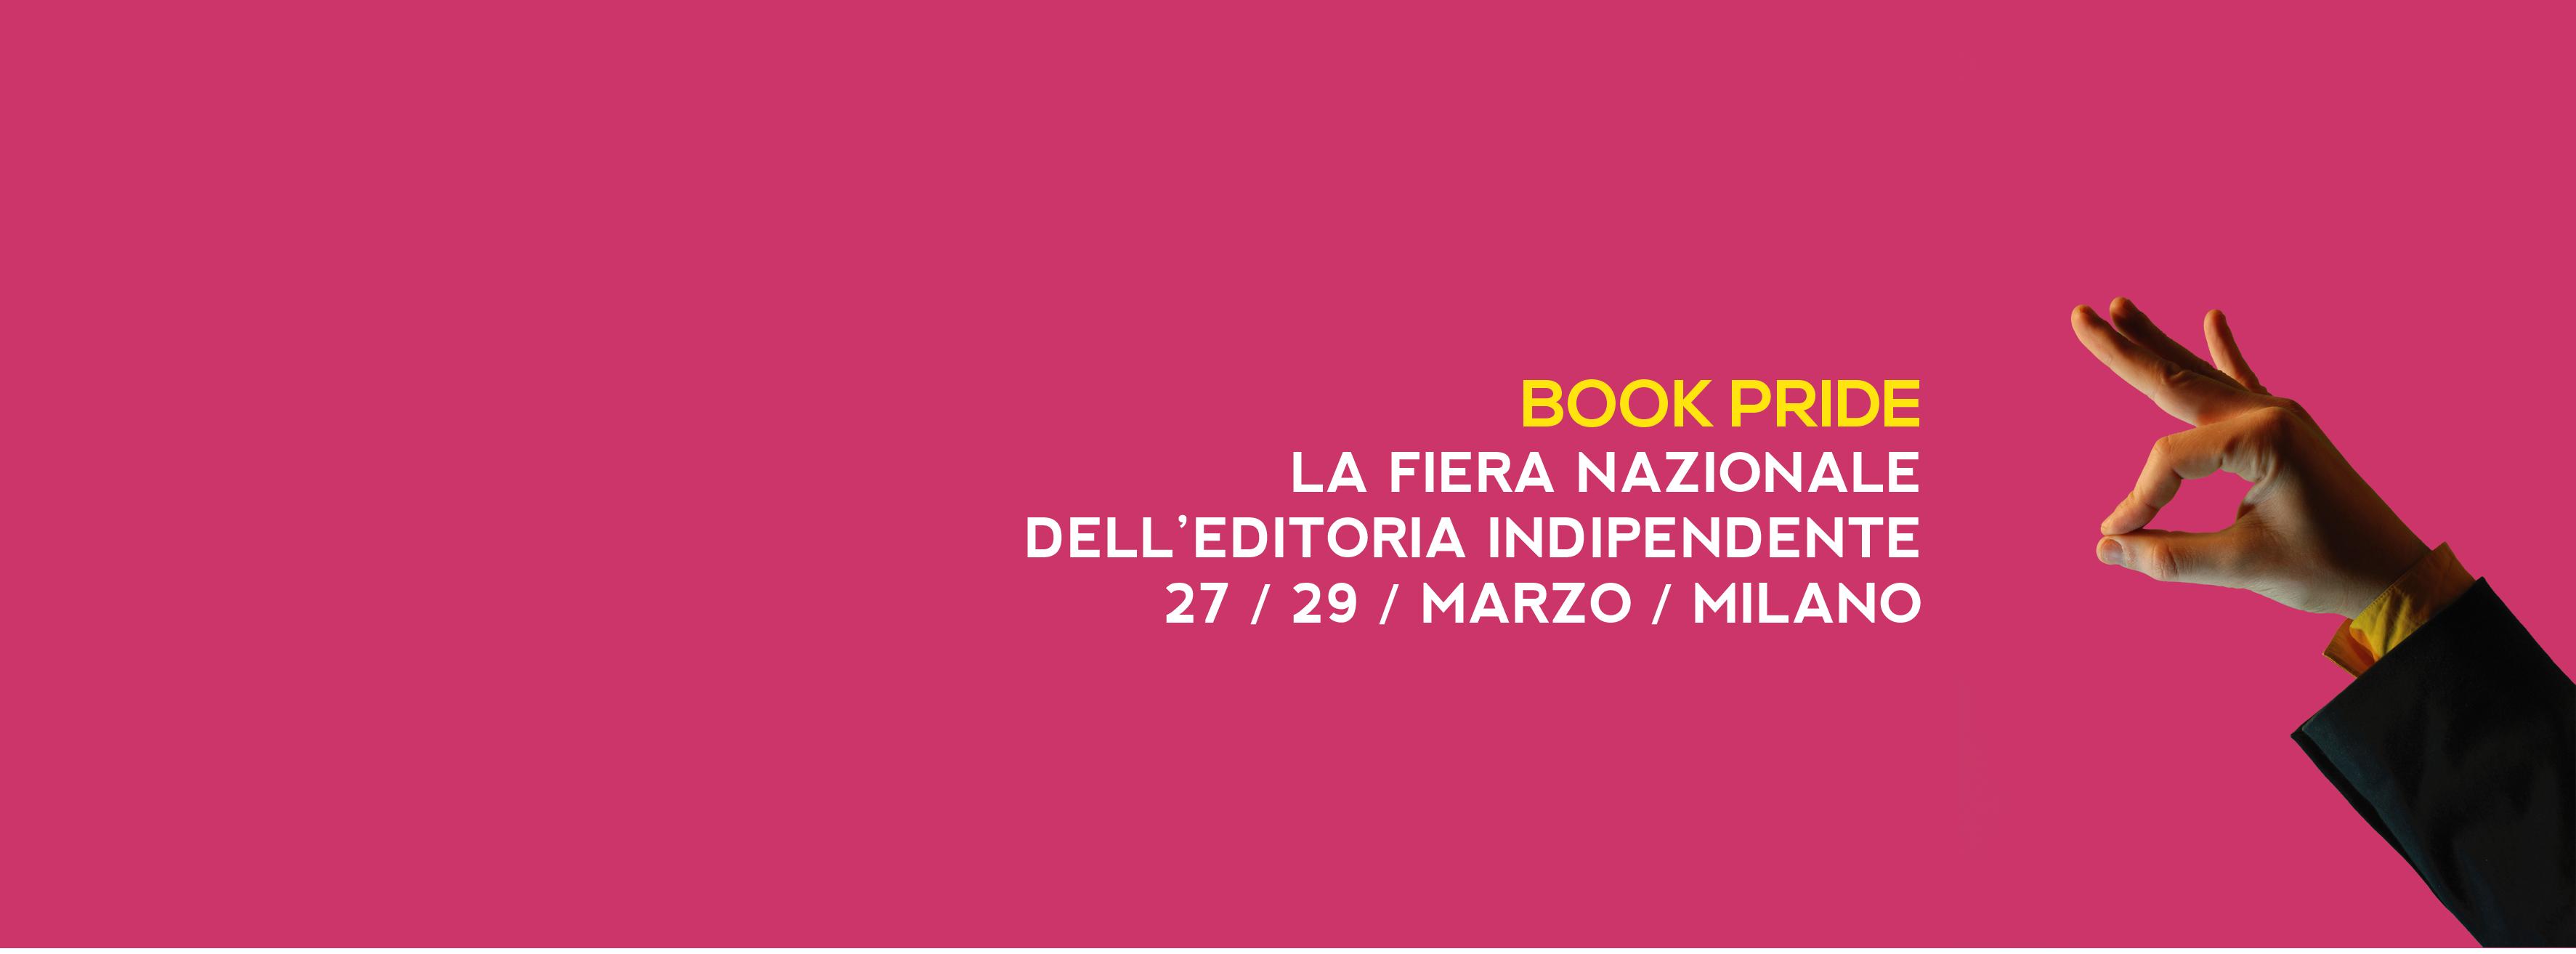 Book Pride Milano 2015 - Porthos.it